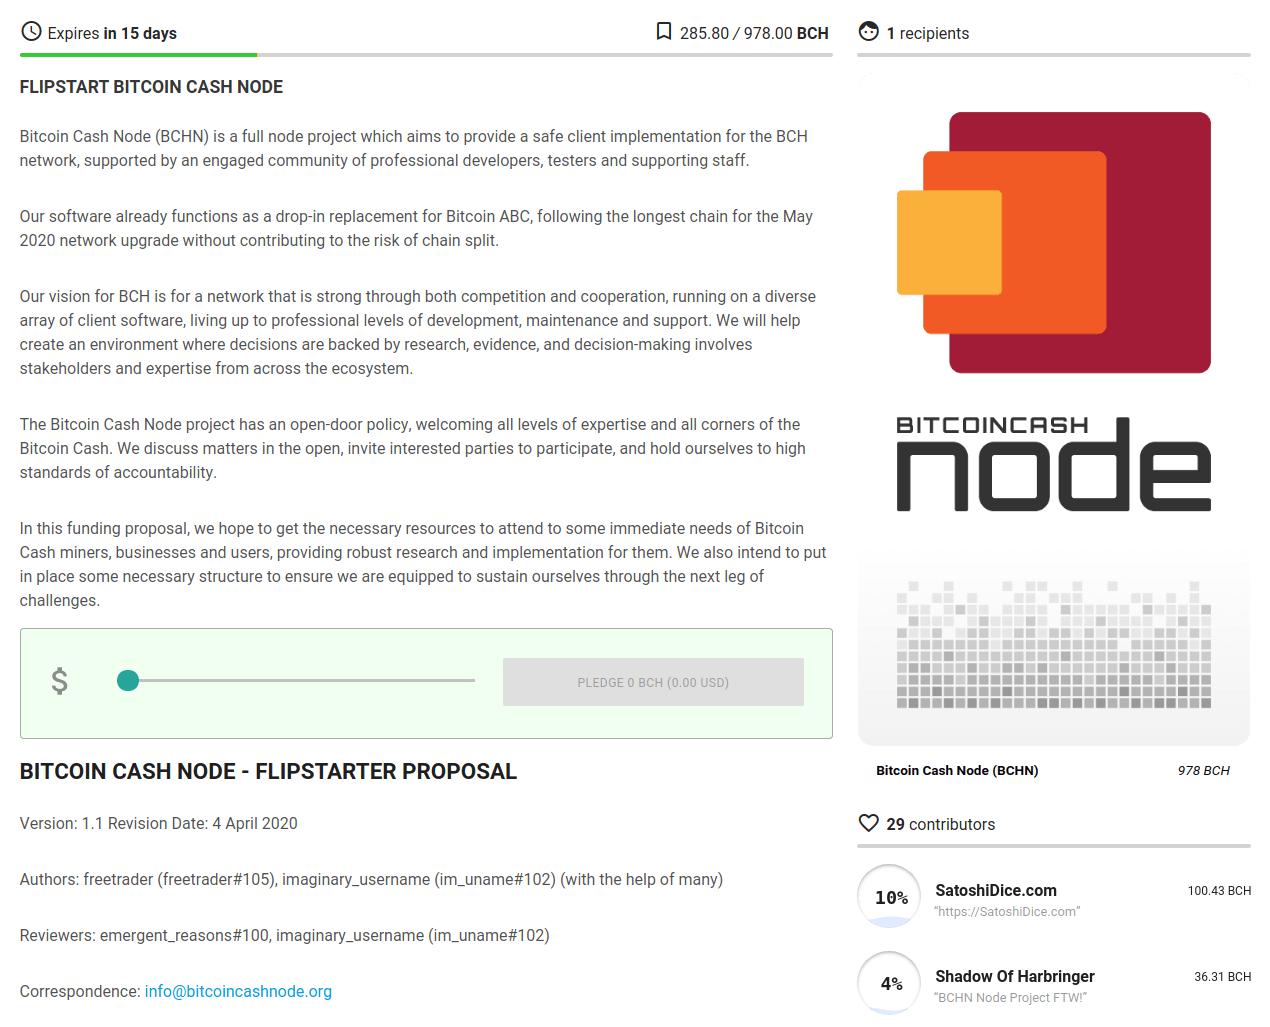 Campagne Flipstarter Bitcoin Cash Node BCHN 23 avril